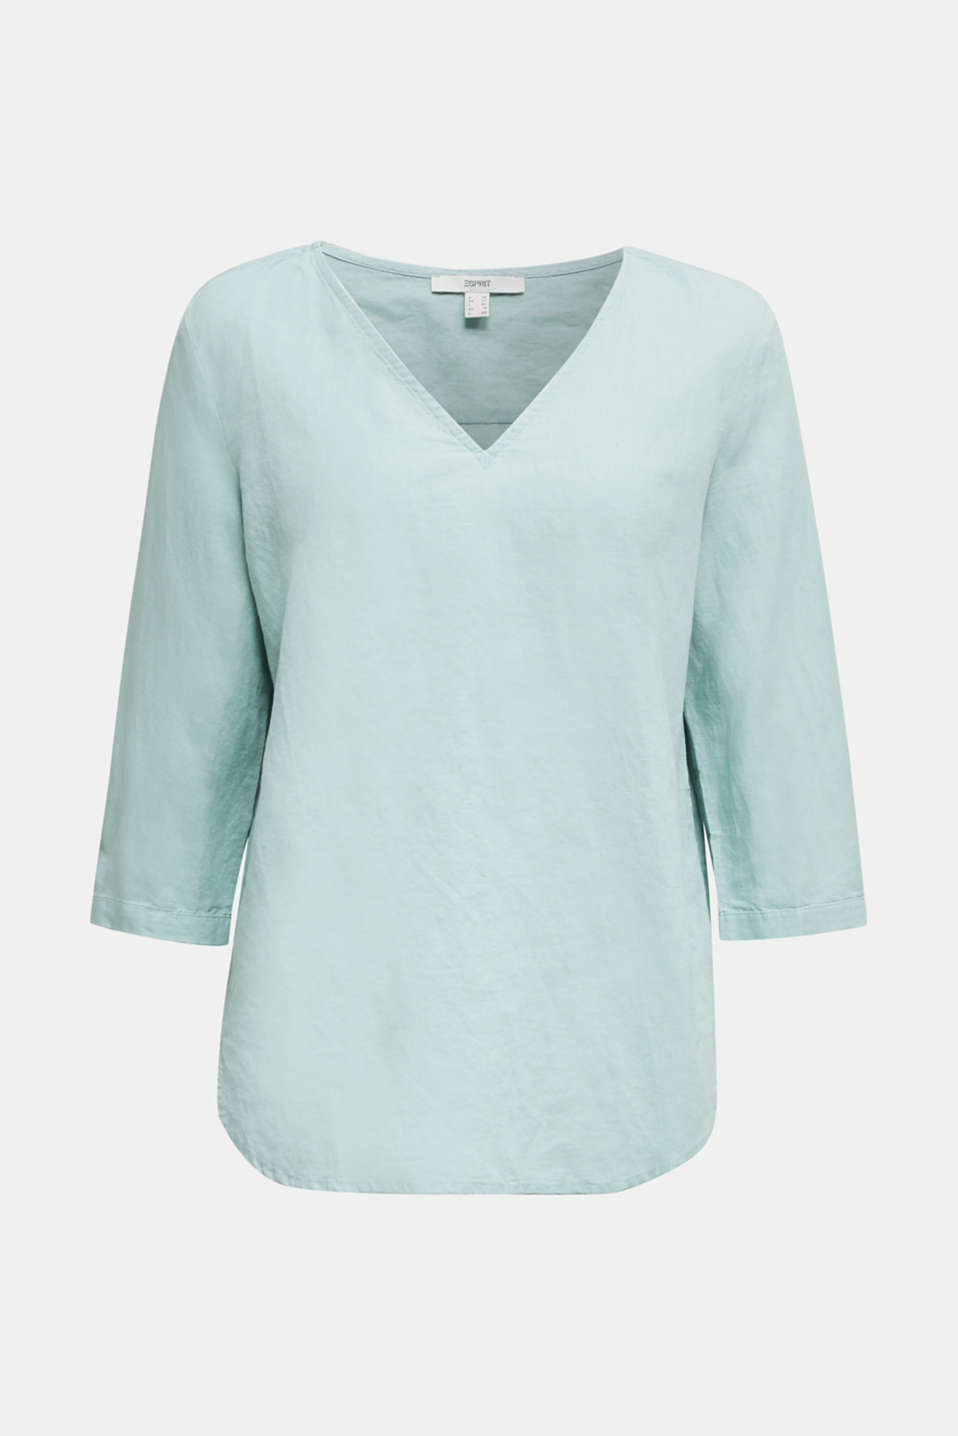 Blended linen blouse with 3/4-length sleeves, LIGHT AQUA GREEN, detail image number 5